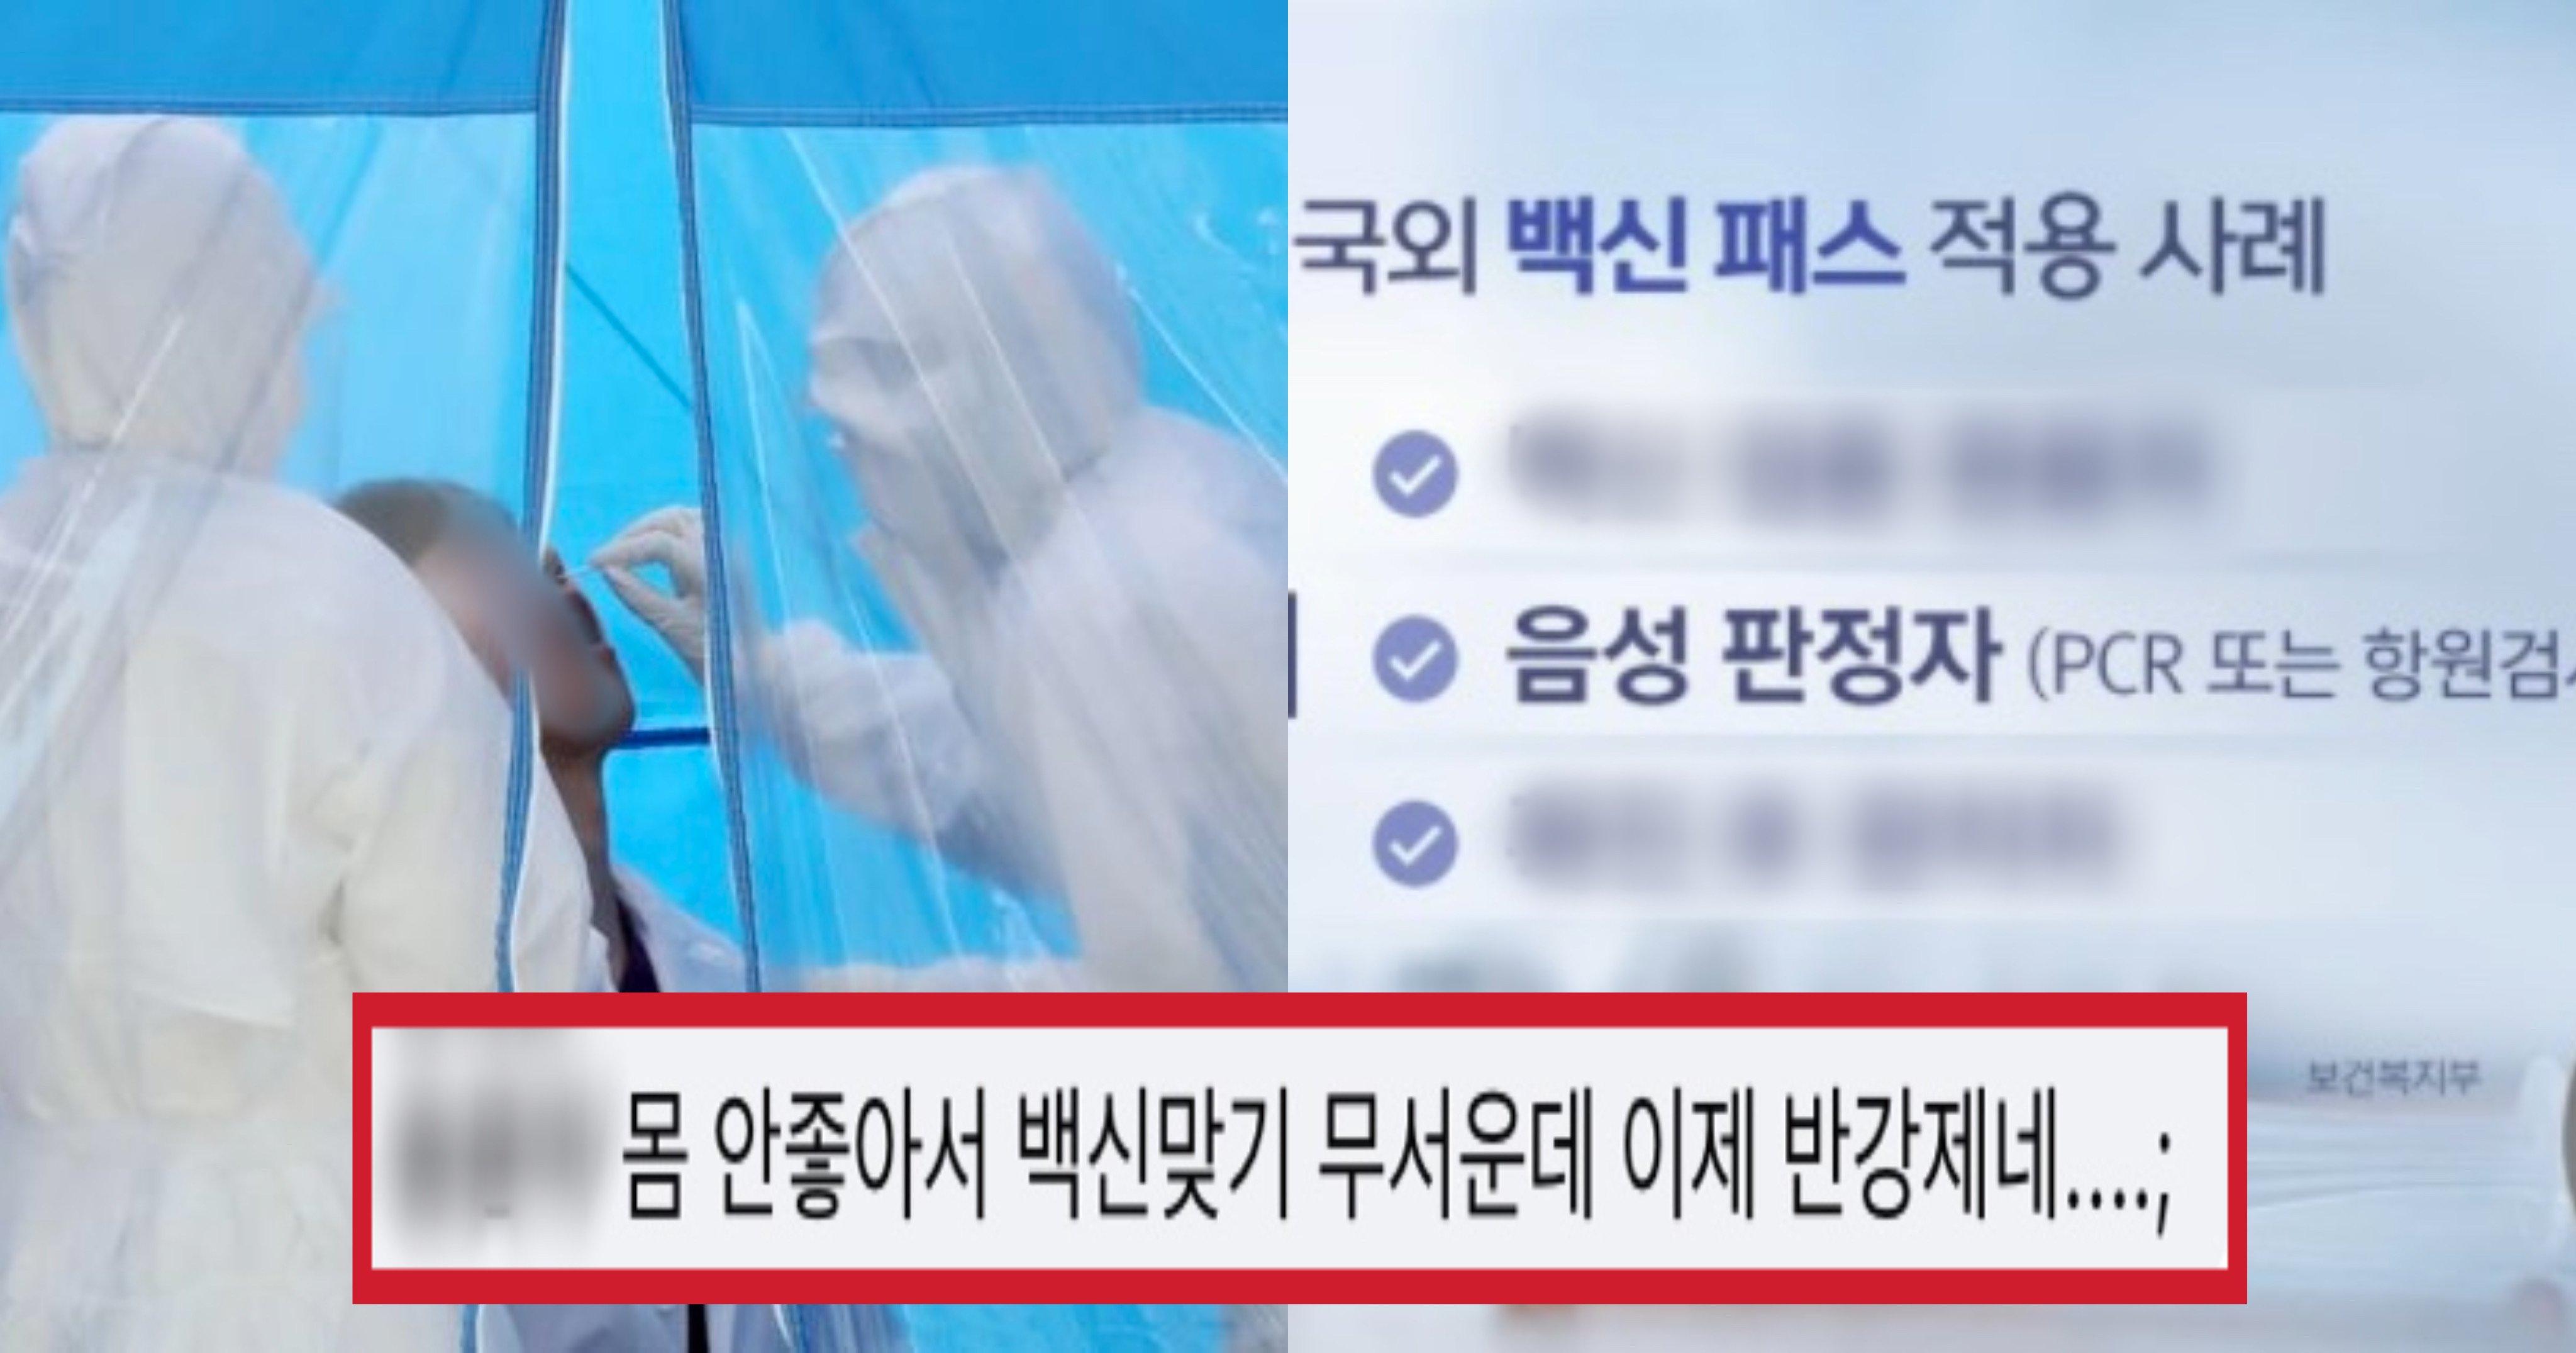 "2ffb722b e5bb 4204 8f99 6c86b3712441.jpeg?resize=1200,630 - ""이 사람들은 백신패스입니다"" 방금 MBC 뉴스에 나온 국내 '백신패스' 검토 논의"